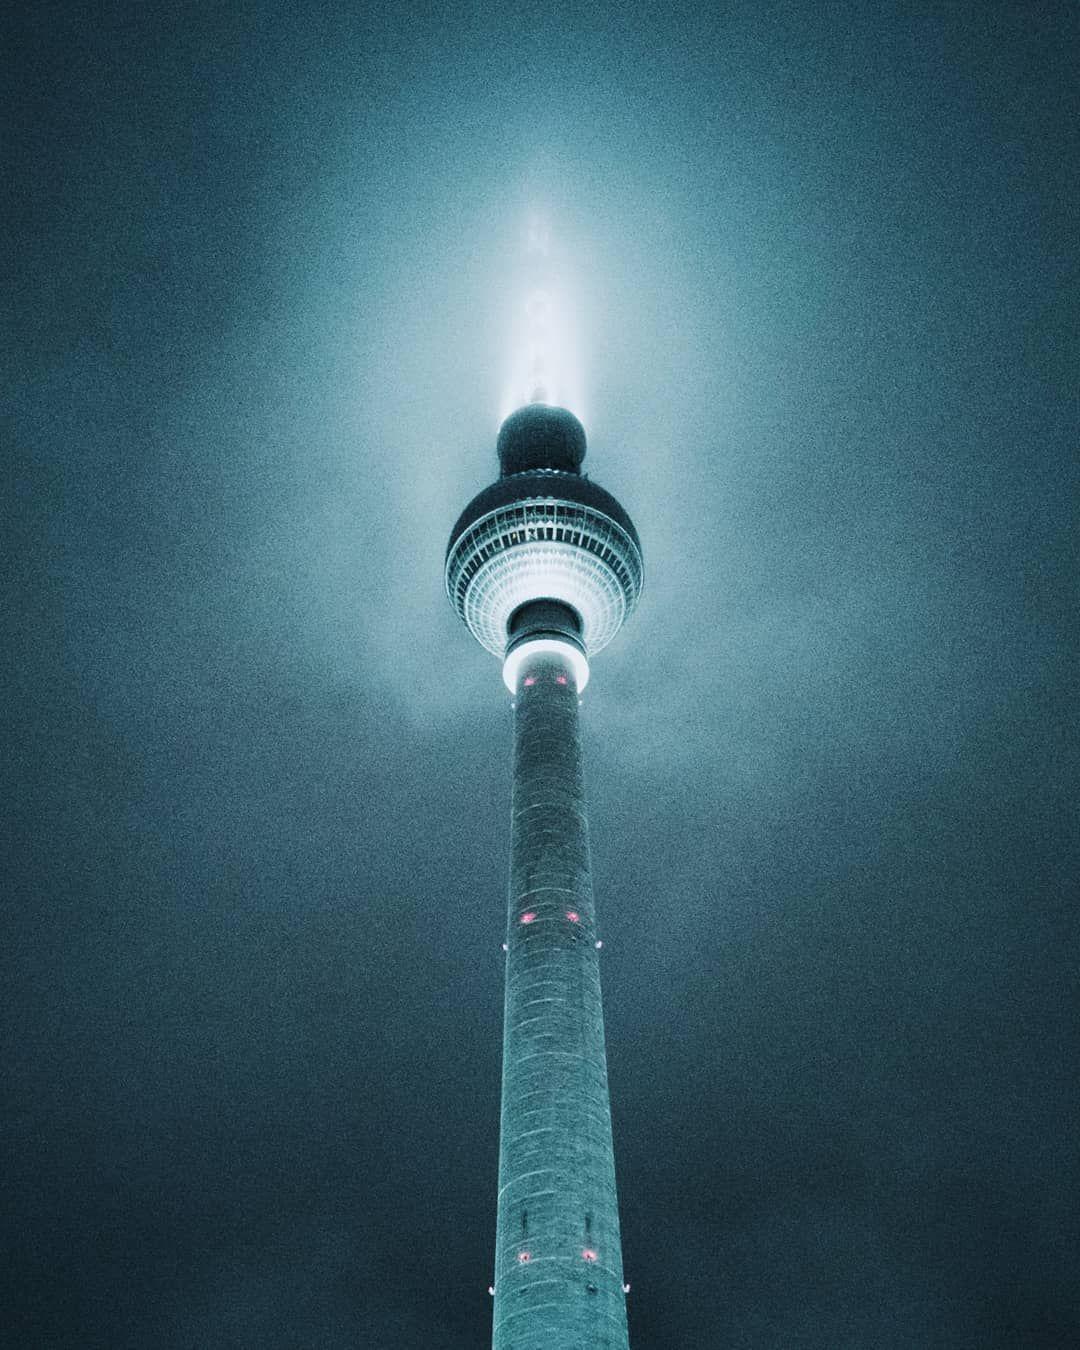 Berliner Fernsehturm Zum Ausdrucken - BERLINGERMAN